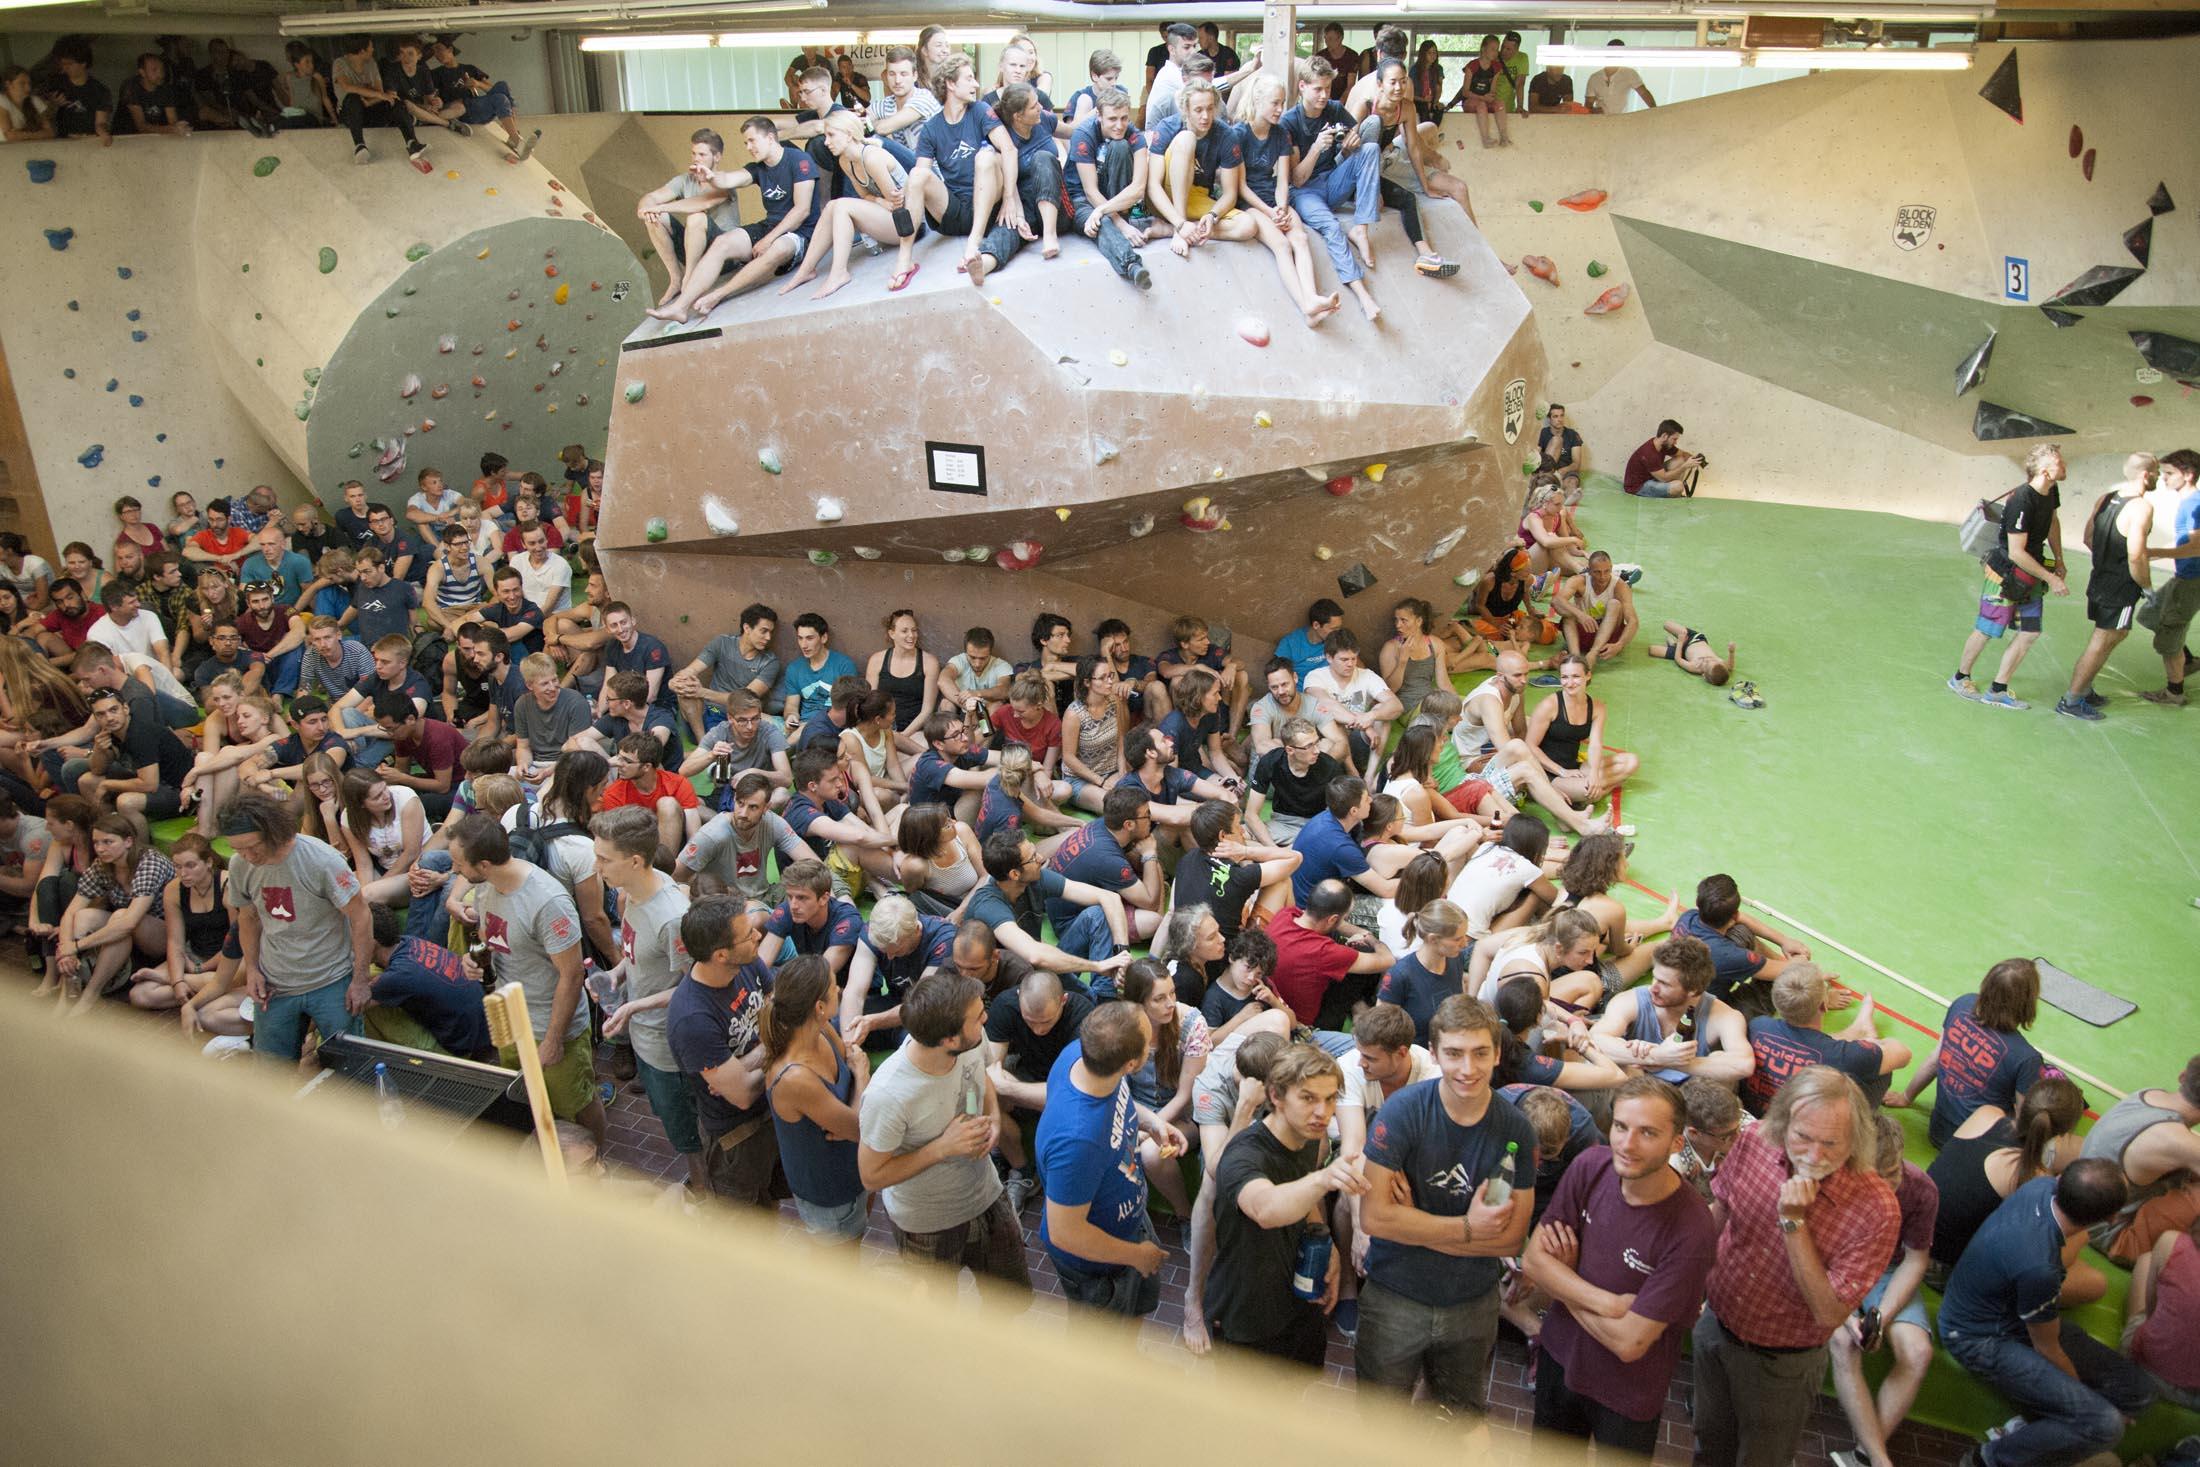 Finale, internationaler bouldercup Frankenjura 2016, BLOCKHELDEN Erlangen, Mammut, Bergfreunde.de, Boulderwettkampf07092016439